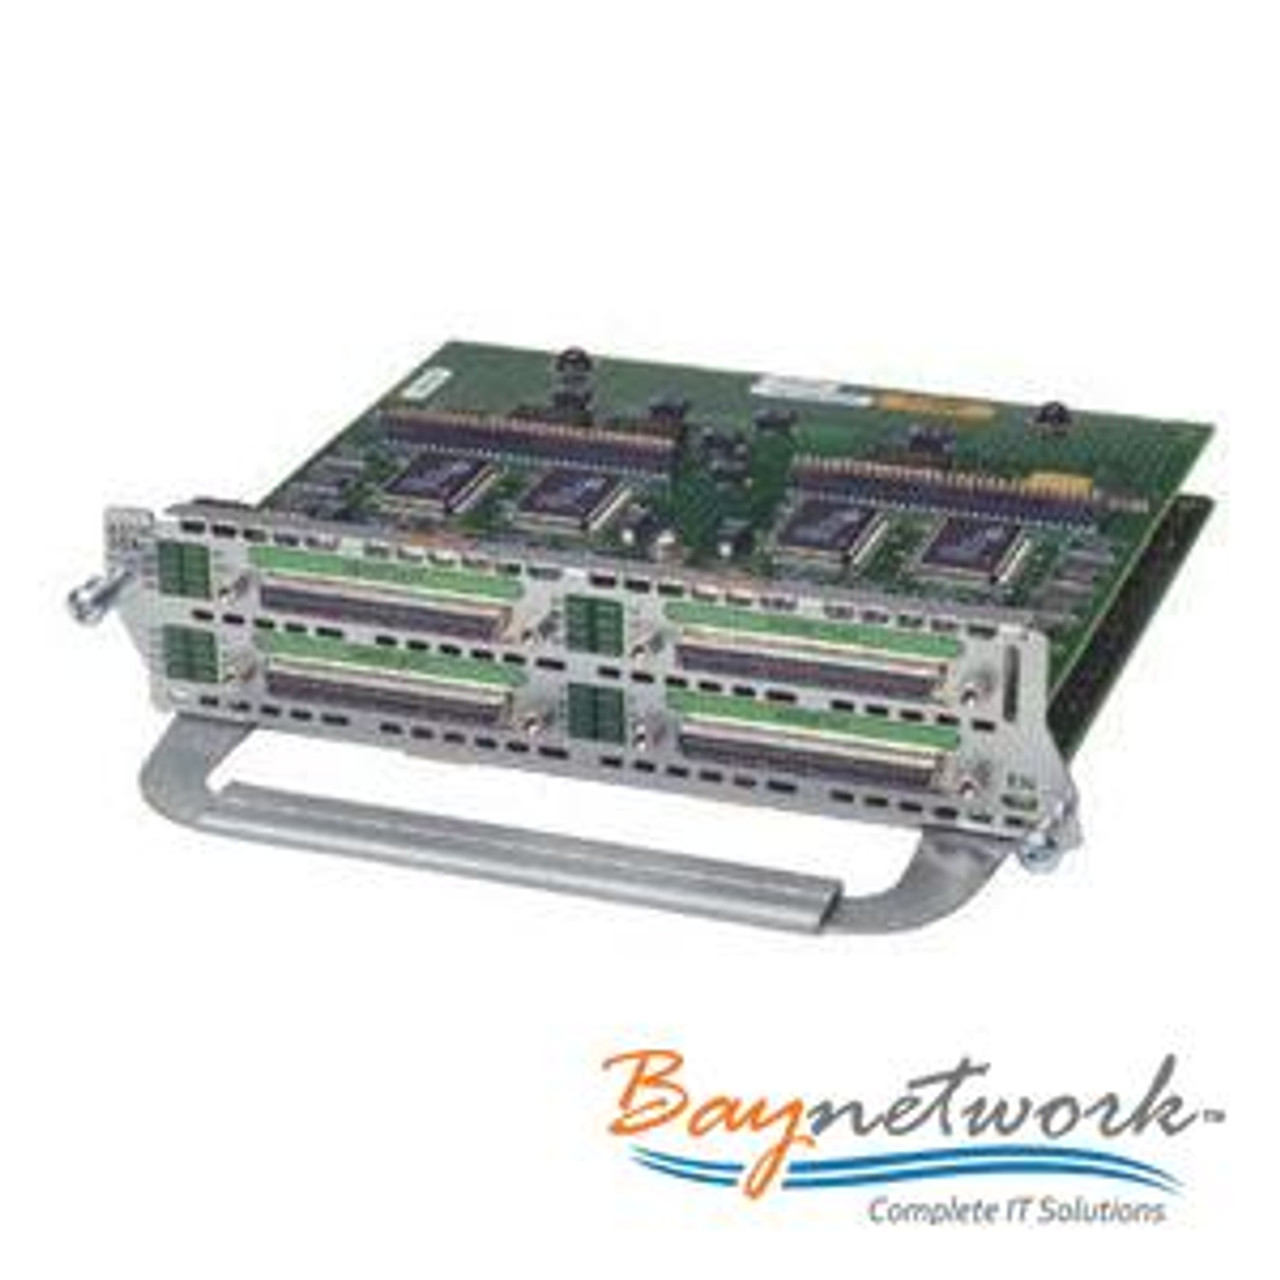 Cisco NM-32A High Density Asynchronous Network Module